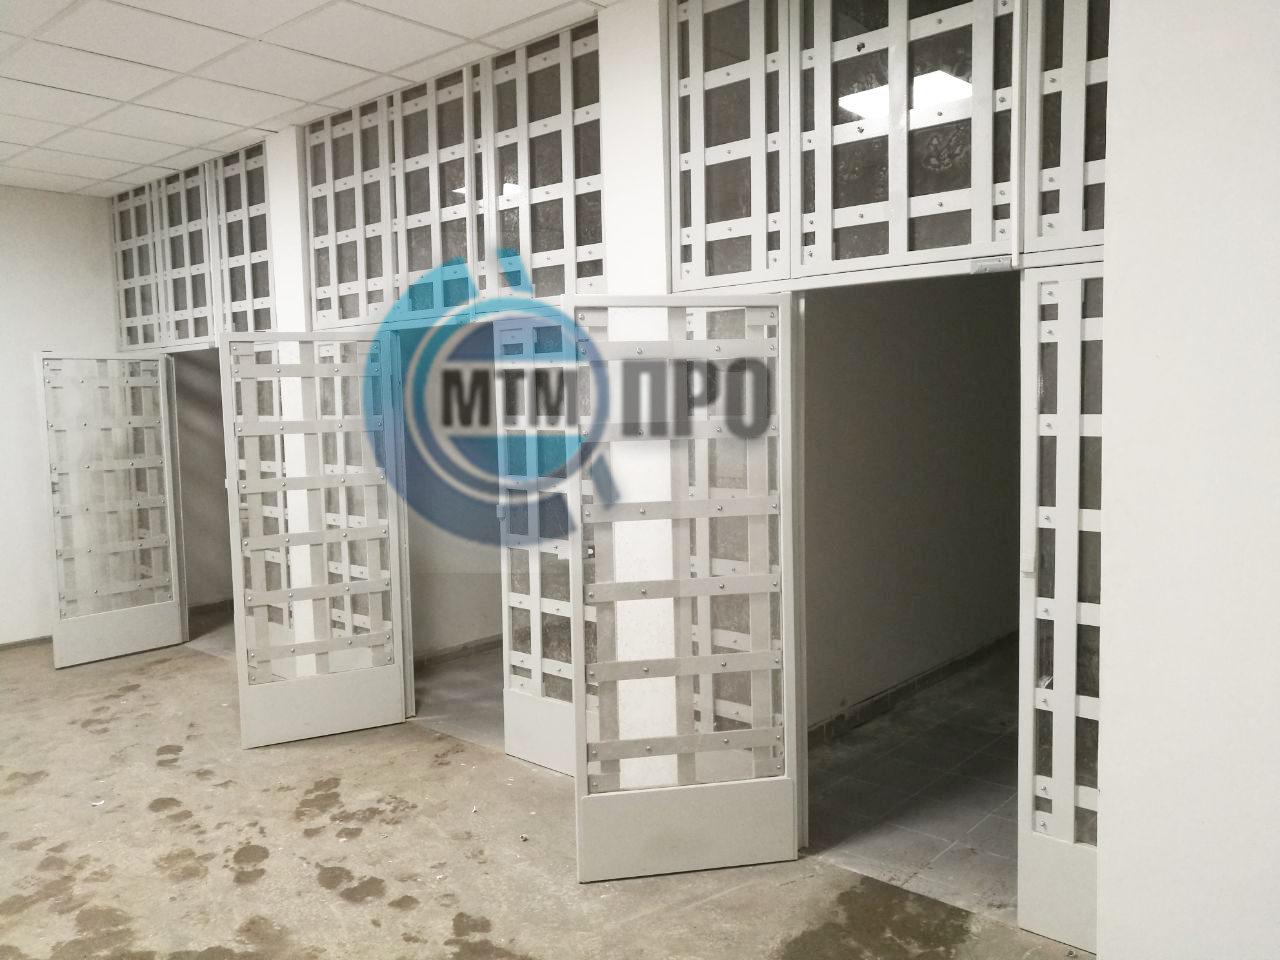 http://mtm-pro.ru/wp-content/uploads/2018/06/stadion5-1280x960.jpg